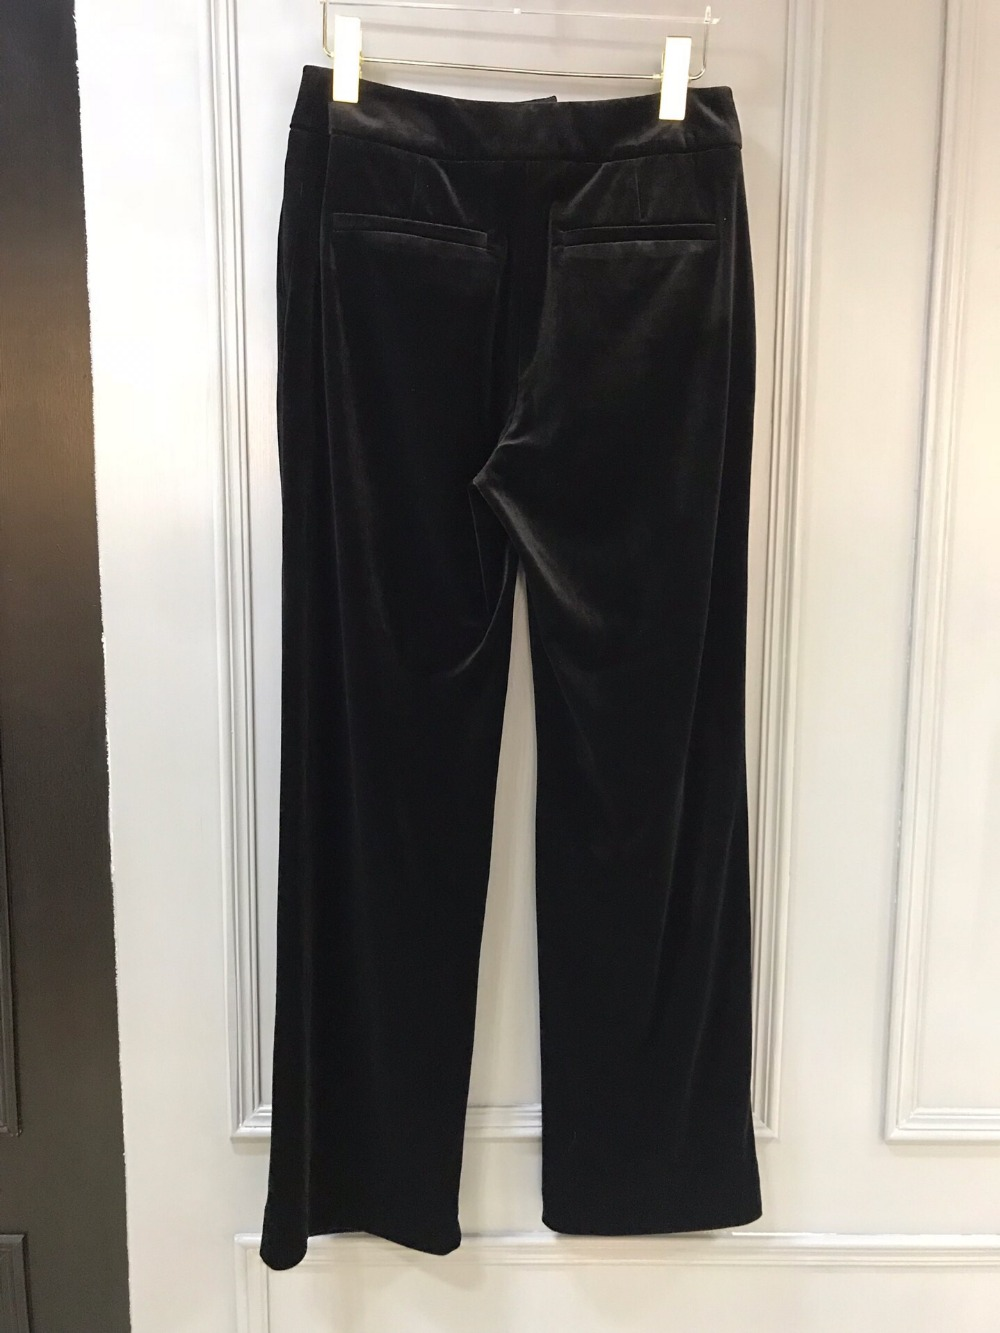 Velours Nouveau Casual Pantalon Trouse Ddxgz3 Femmes Printemps 2019 m7vIf6yYbg